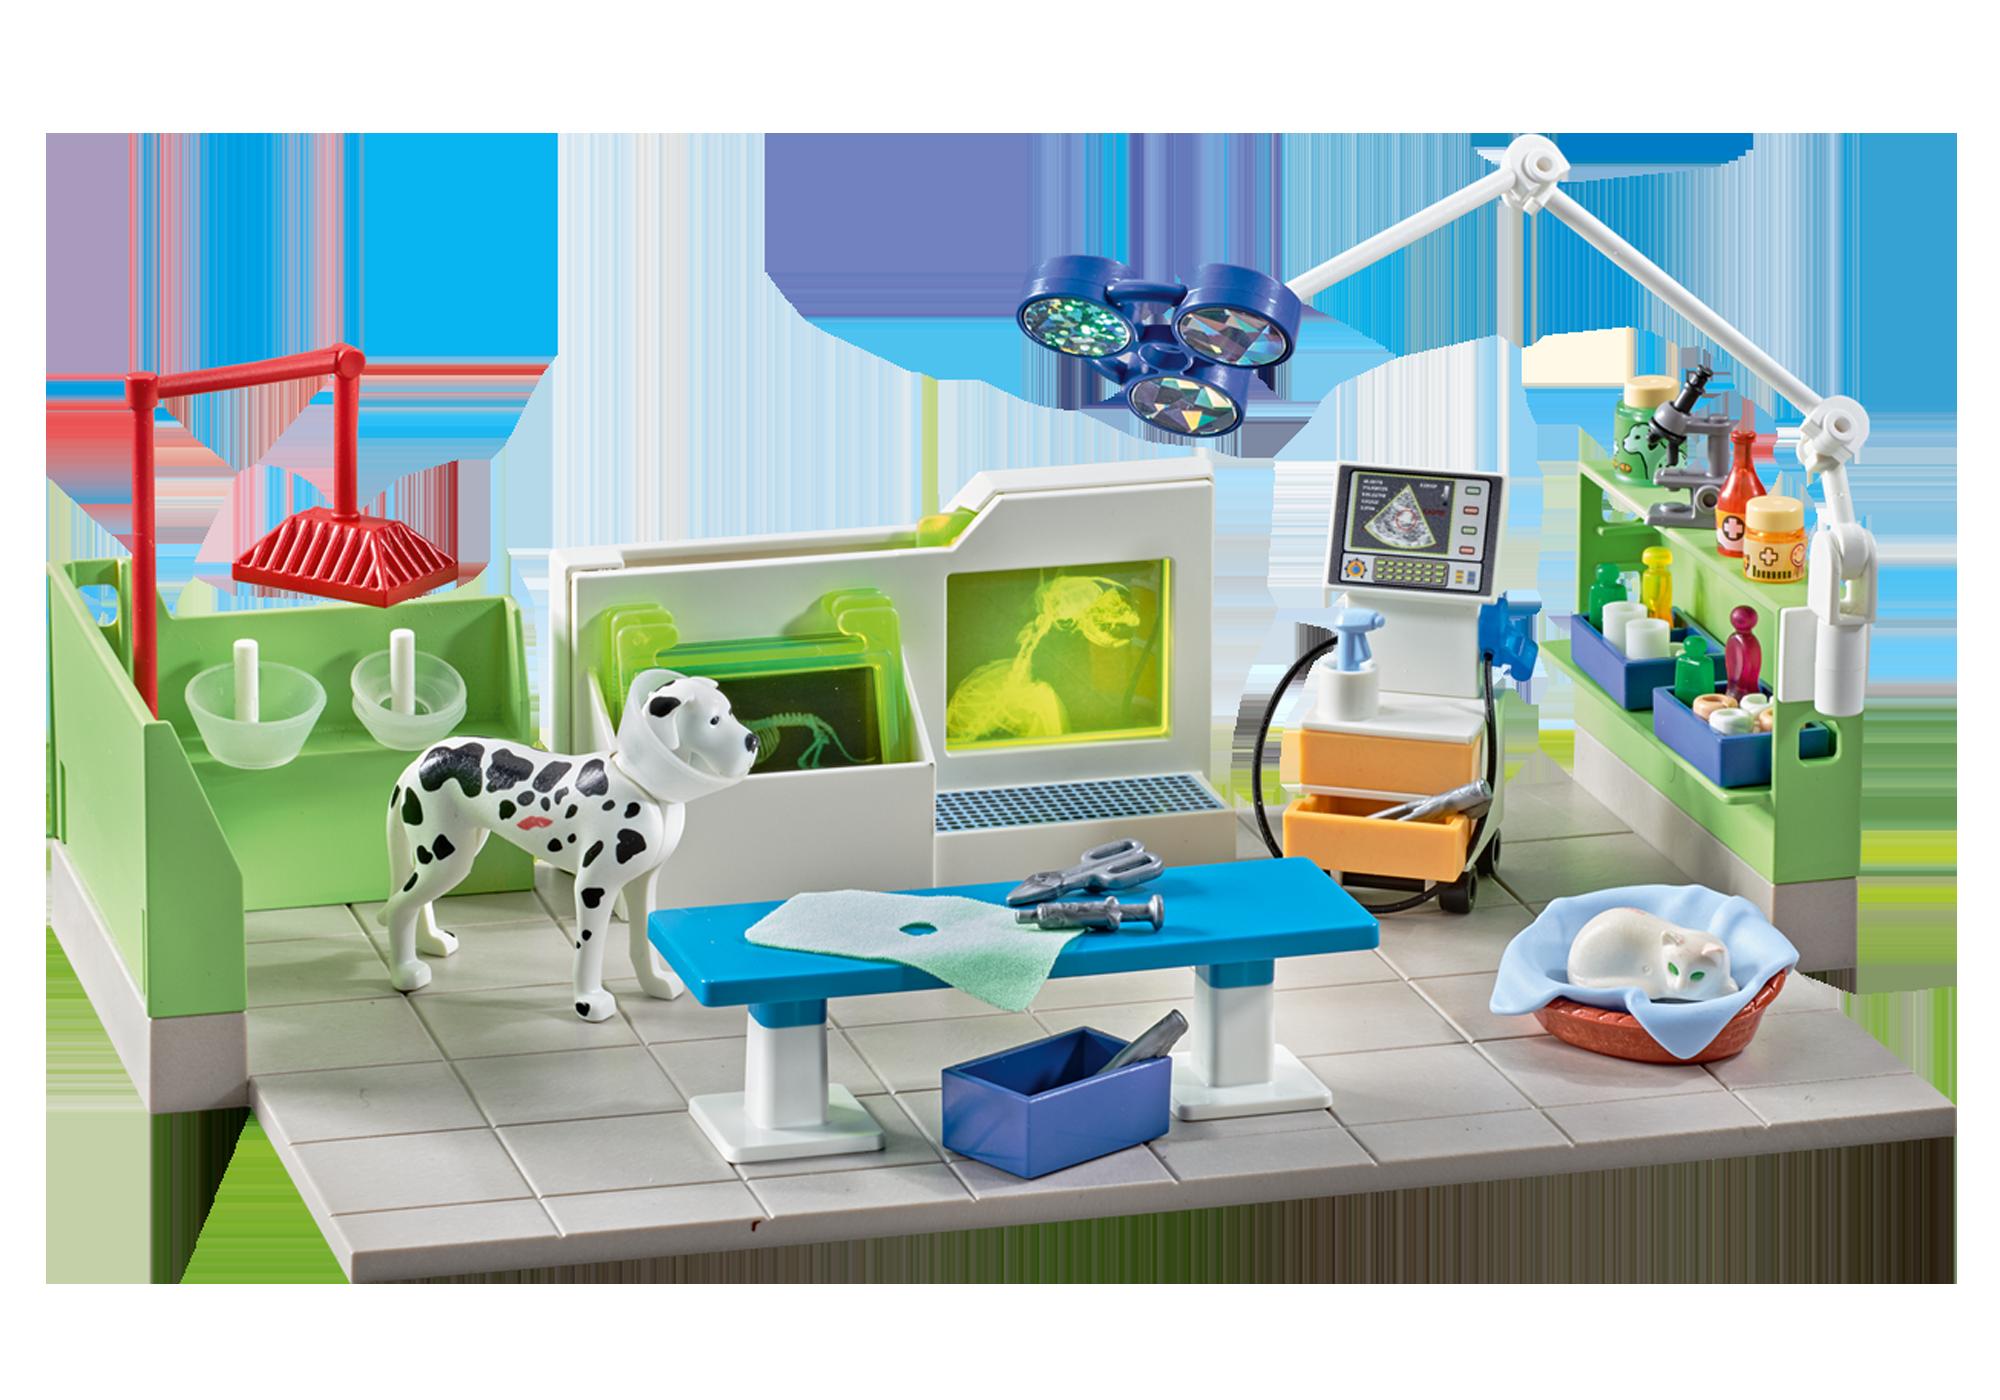 http://media.playmobil.com/i/playmobil/9816_product_detail/Vet Clinic with X-Ray Machine